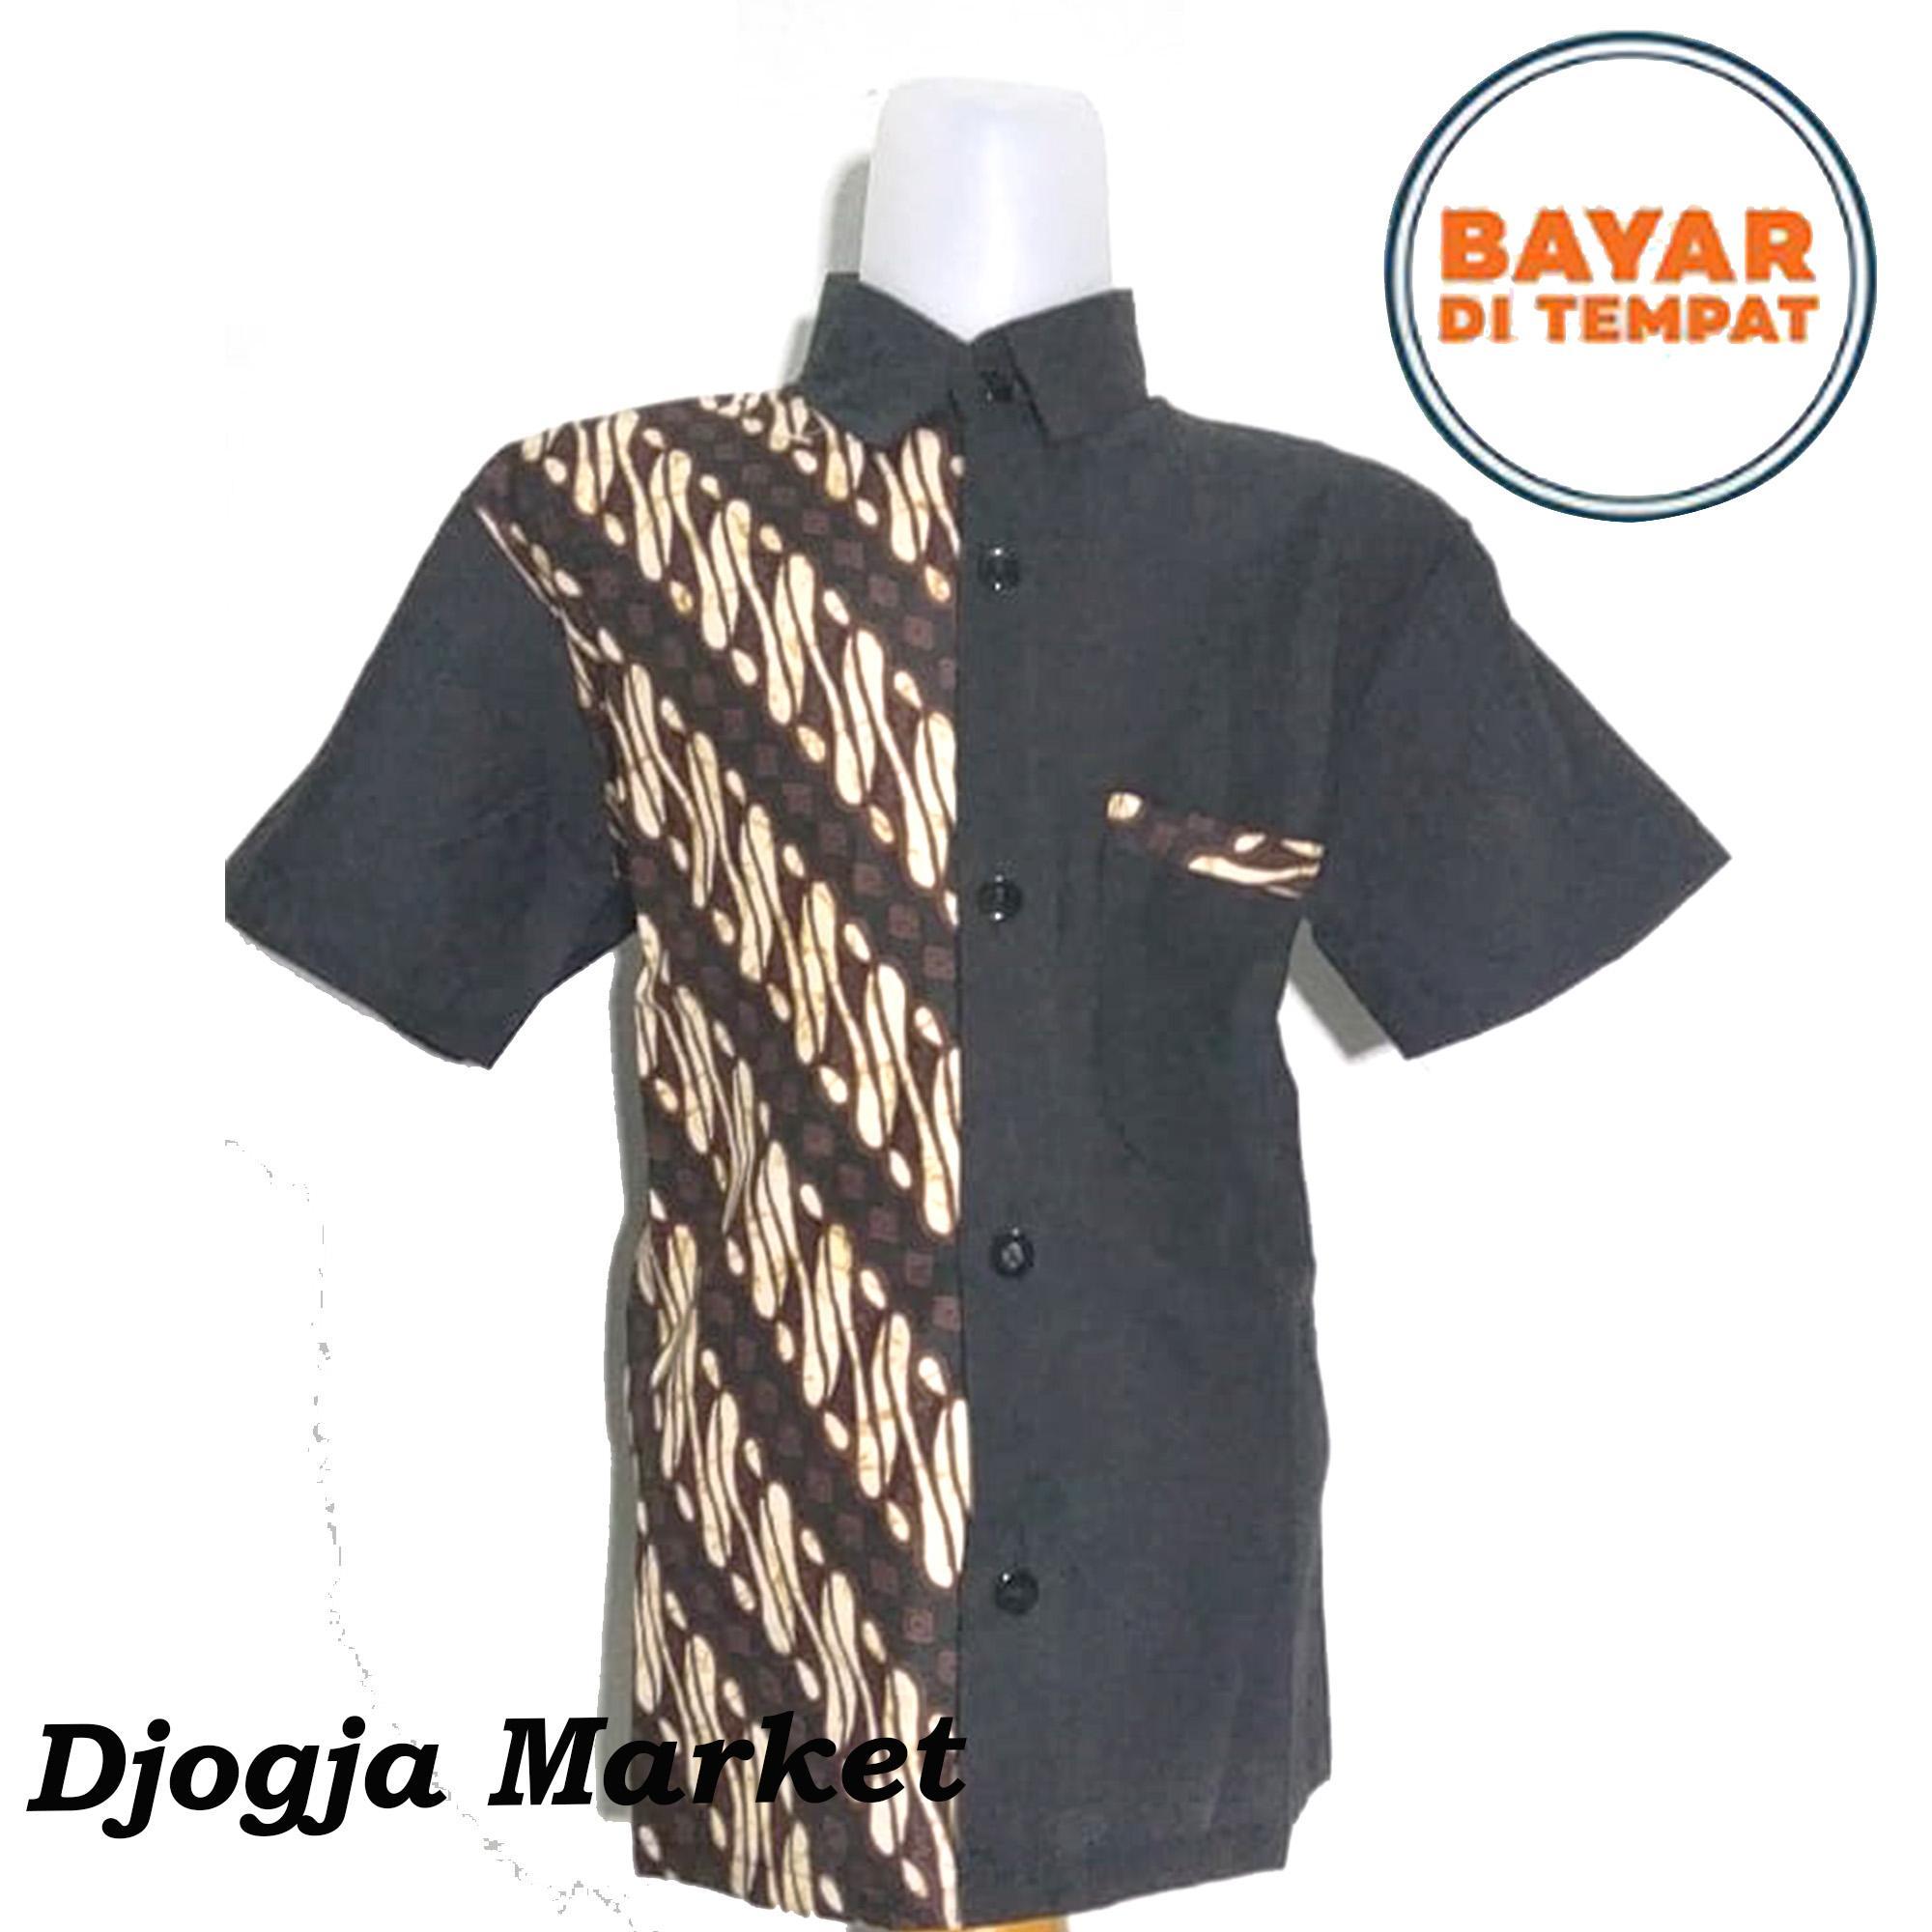 Djogja Market - Kemeja Batik Anak Model Premium BKN-001